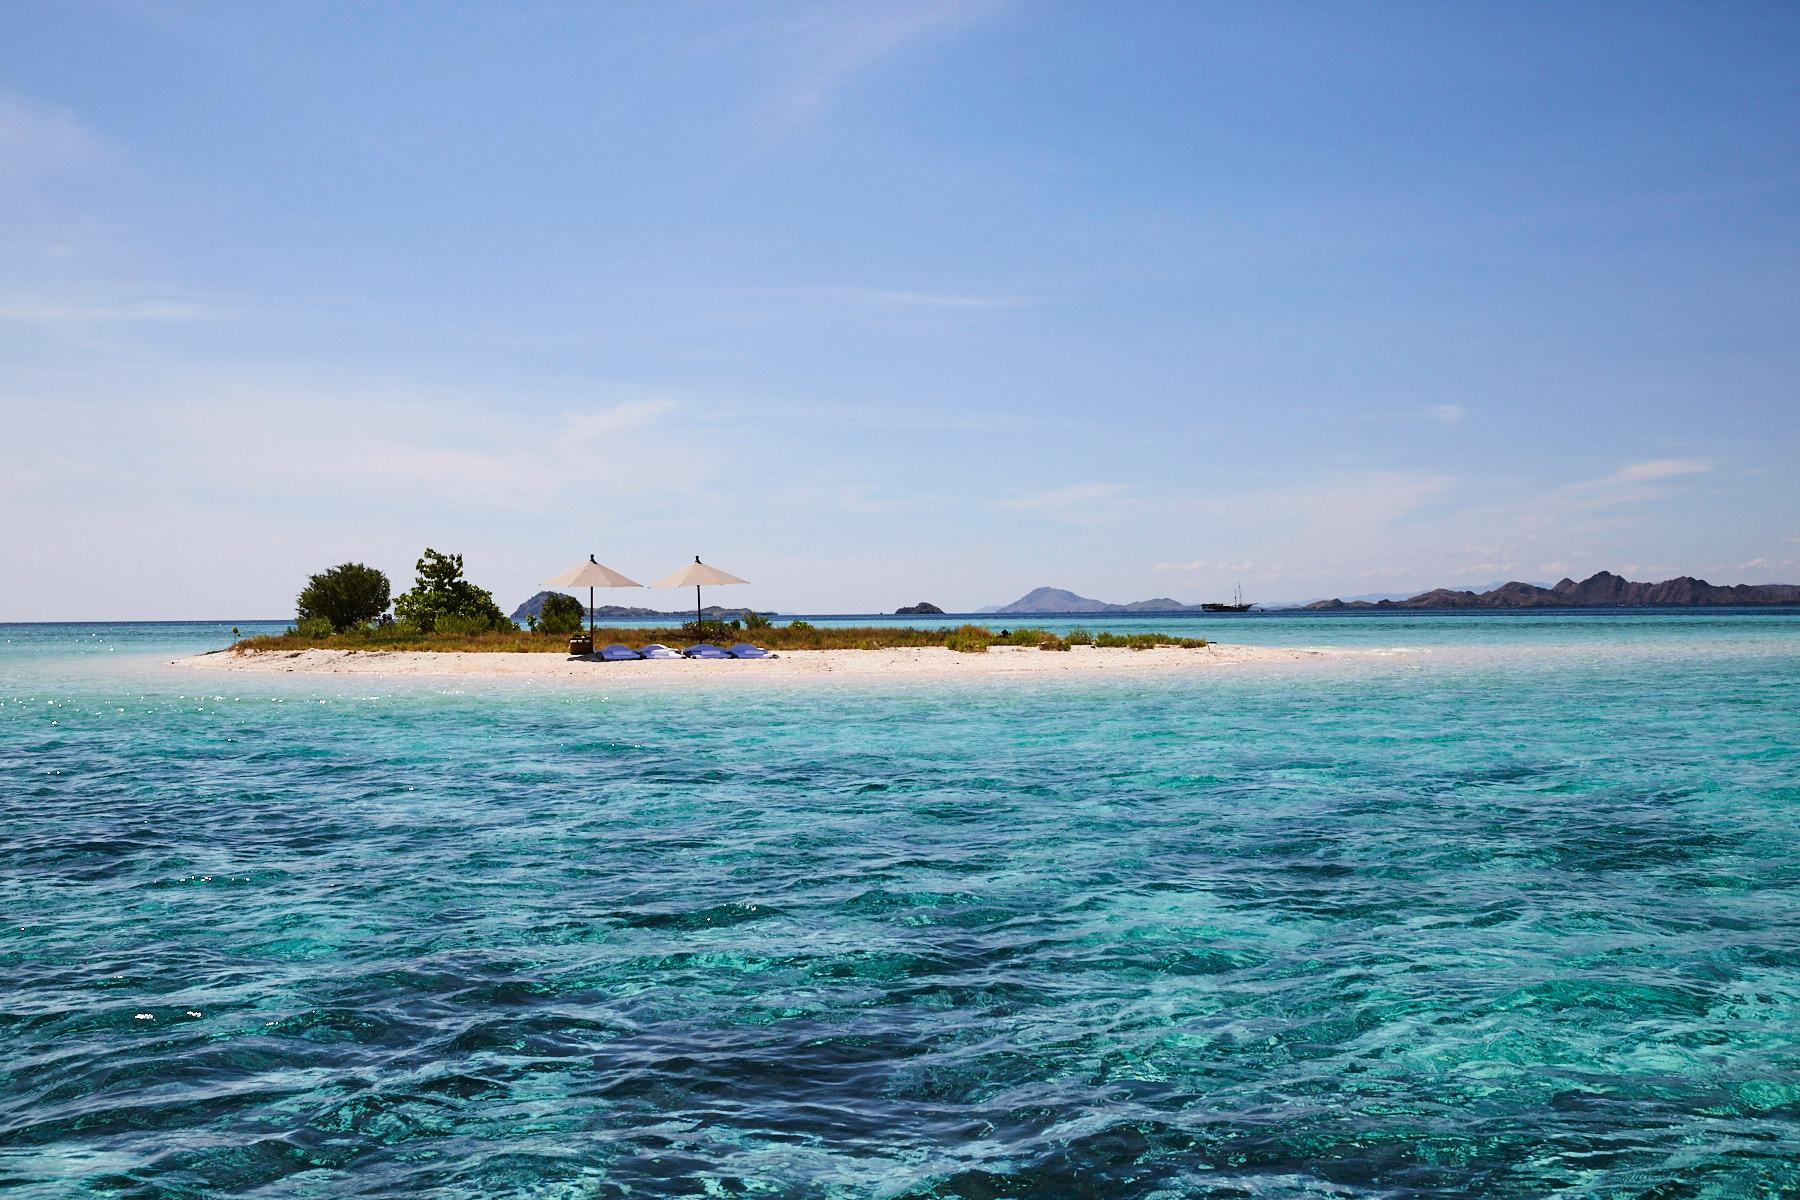 Island on Makassar Reef